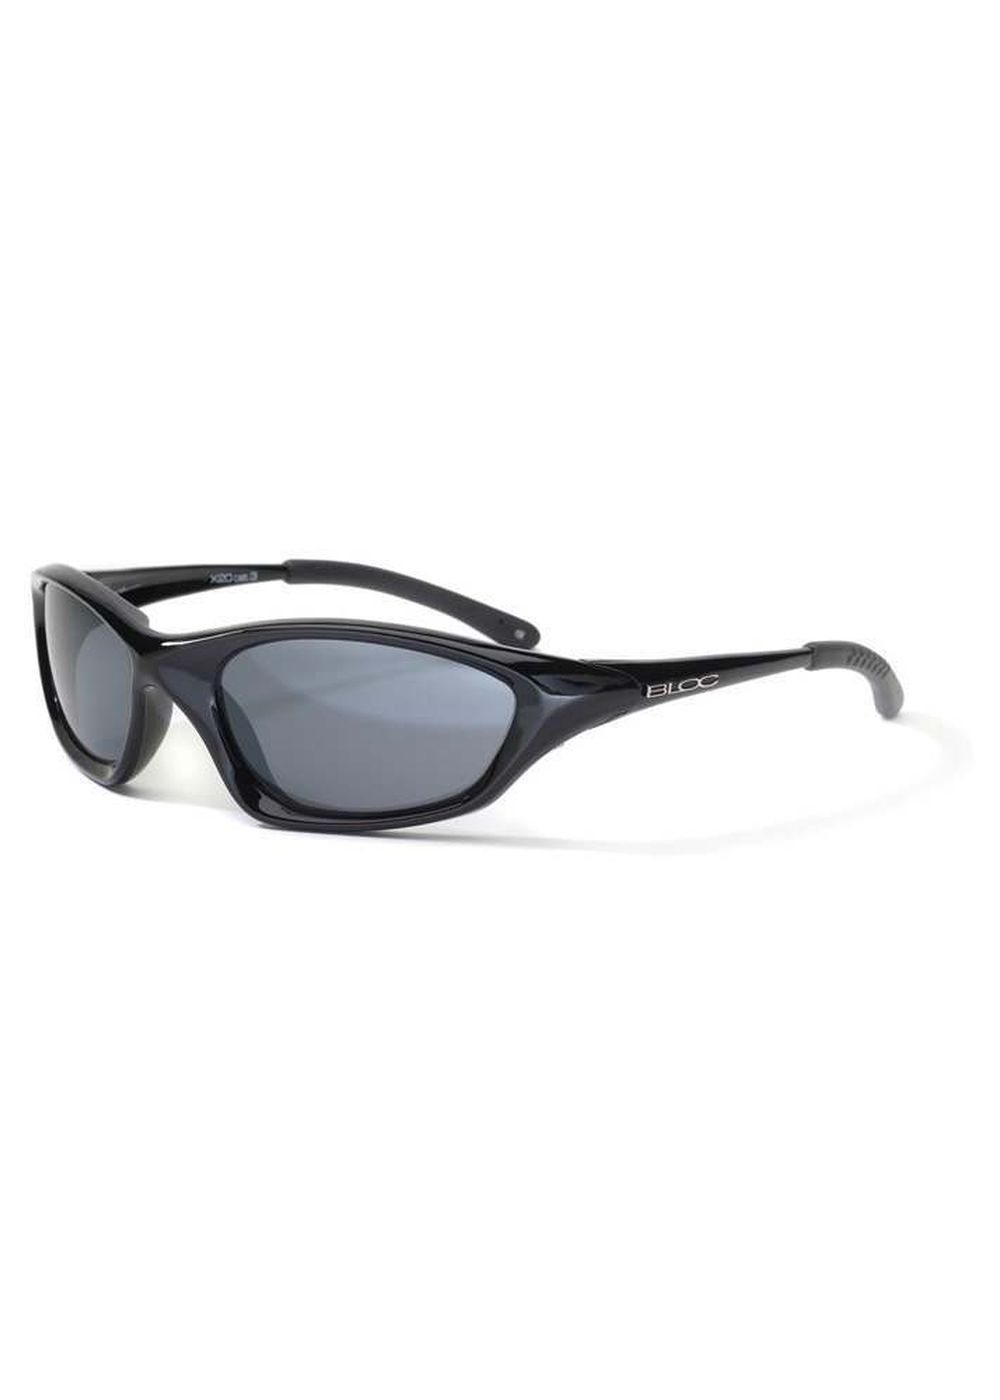 BLOC COBRA SUNGLASSES Shiny Black/Grey Flash